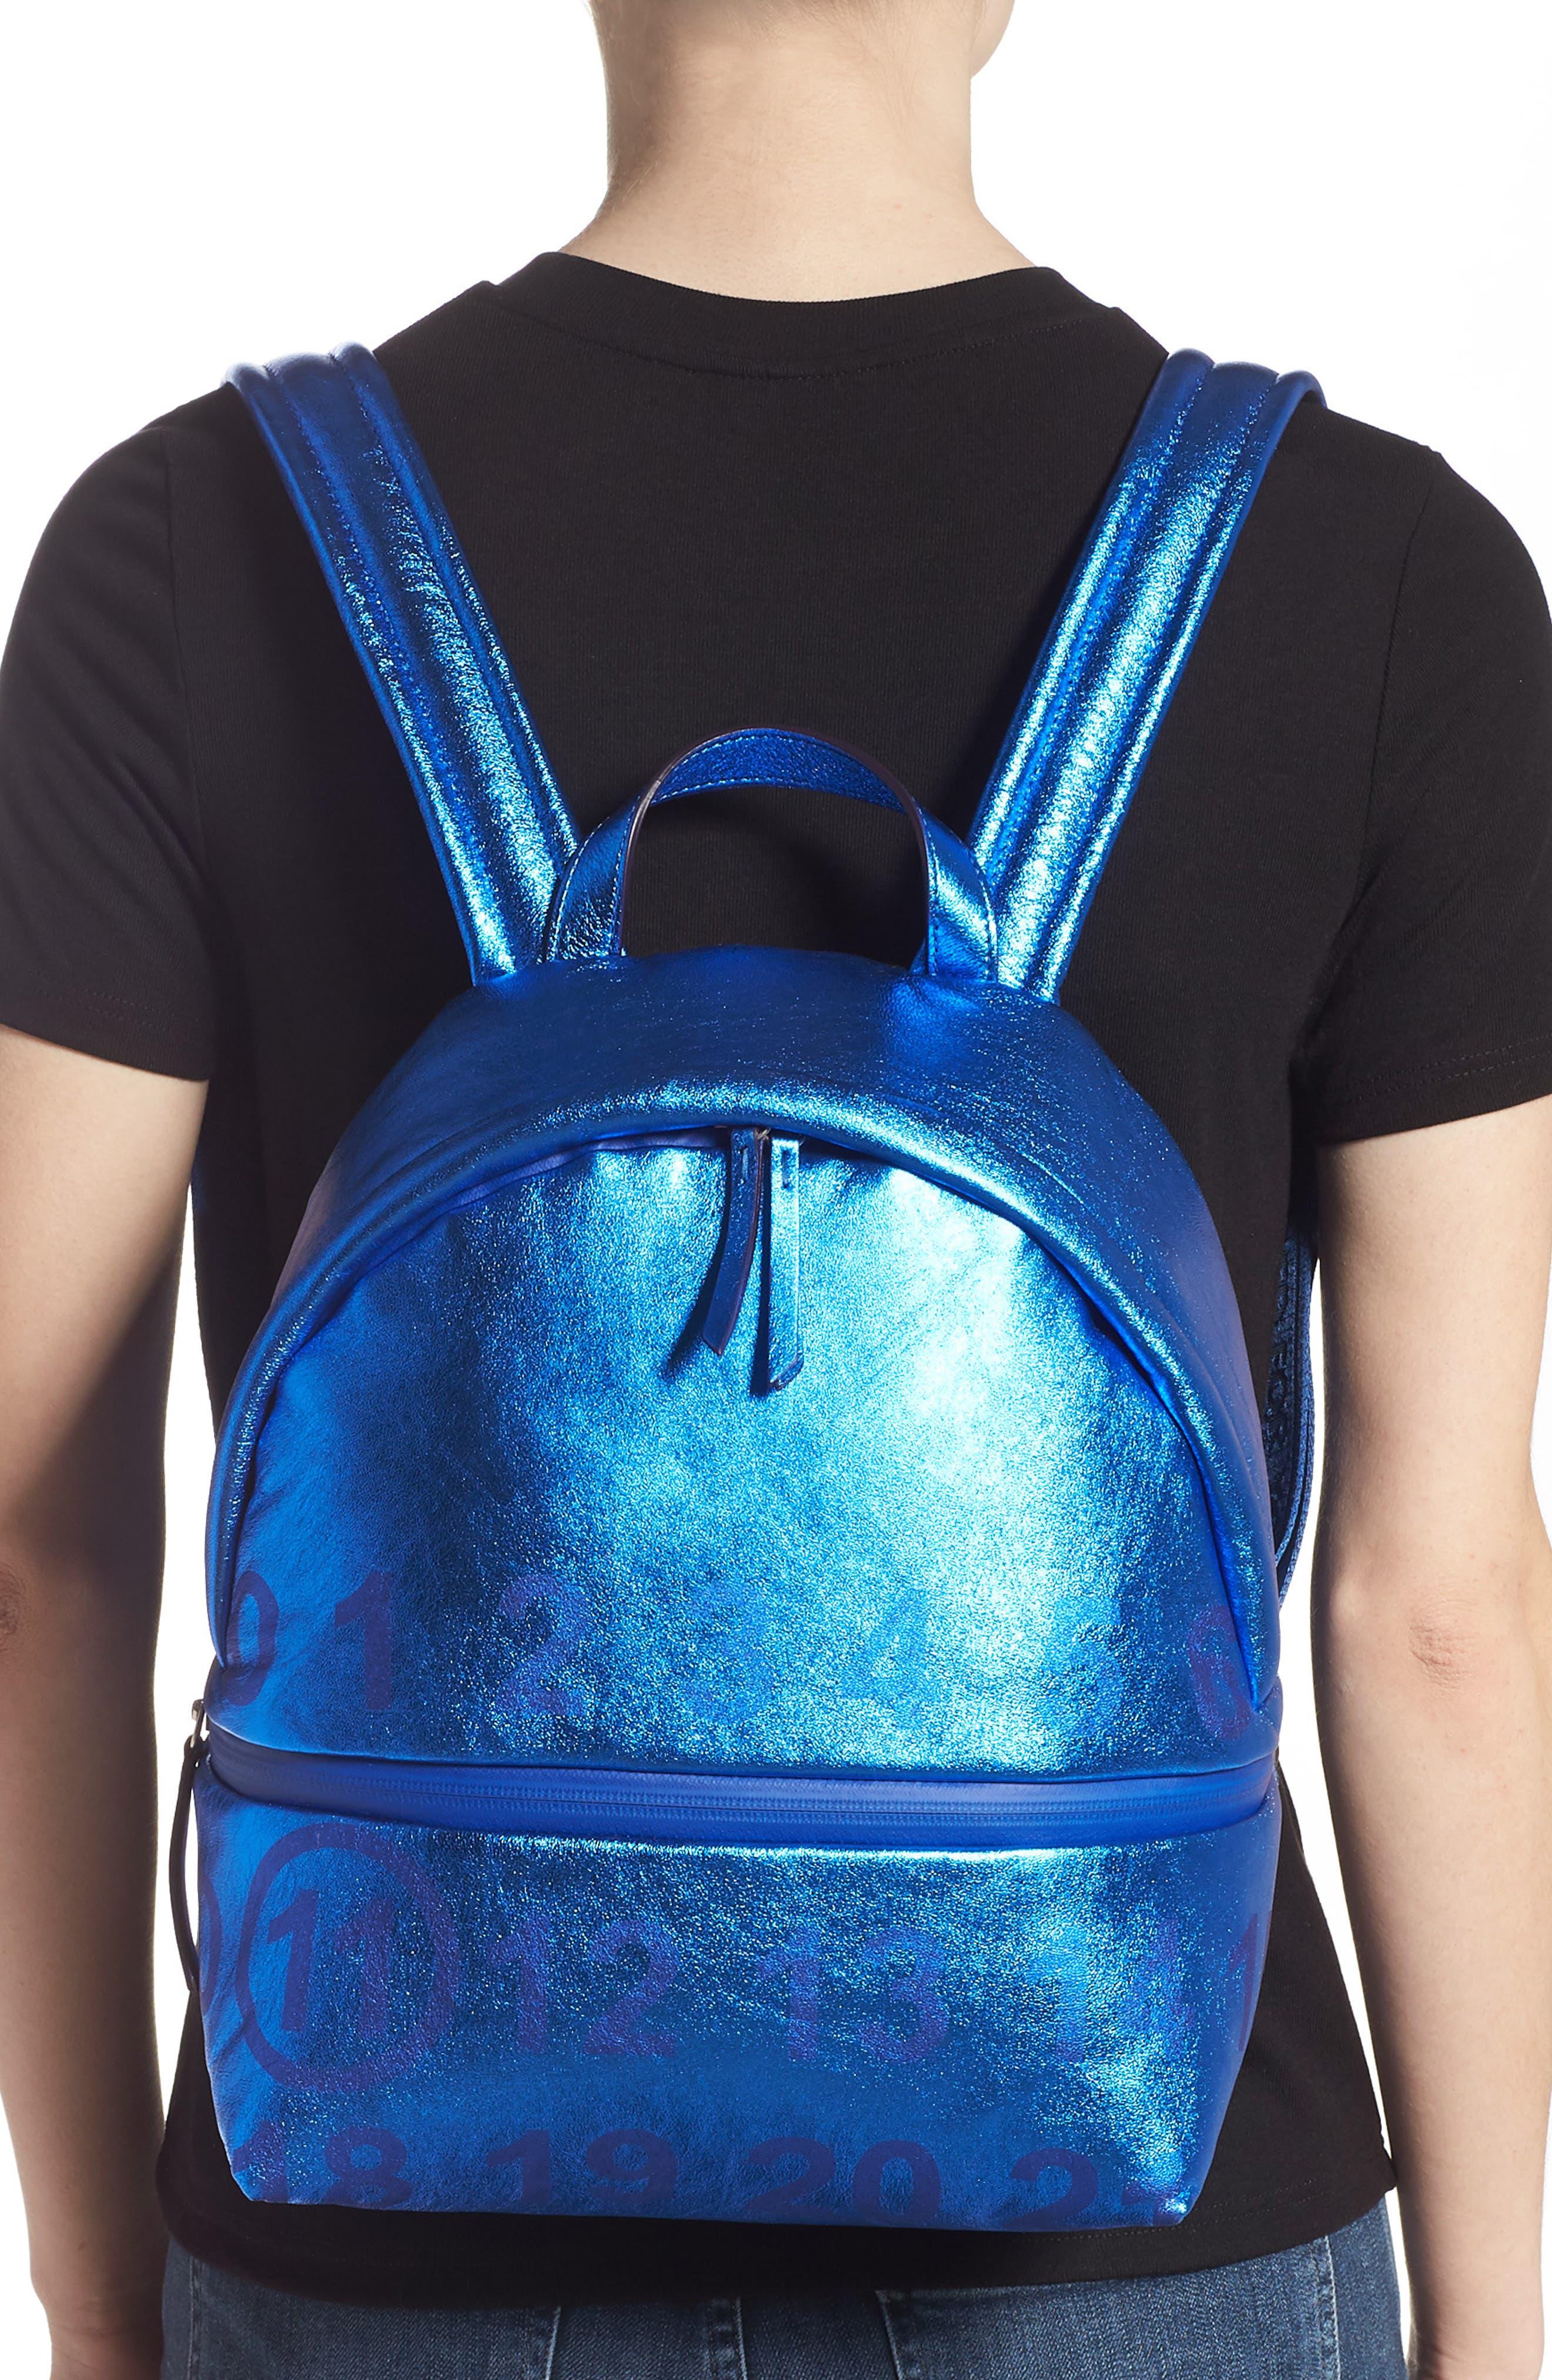 MAISON MARGIELA,                             Medium Number Print Backpack,                             Alternate thumbnail 2, color,                             DAZZLING BLUE